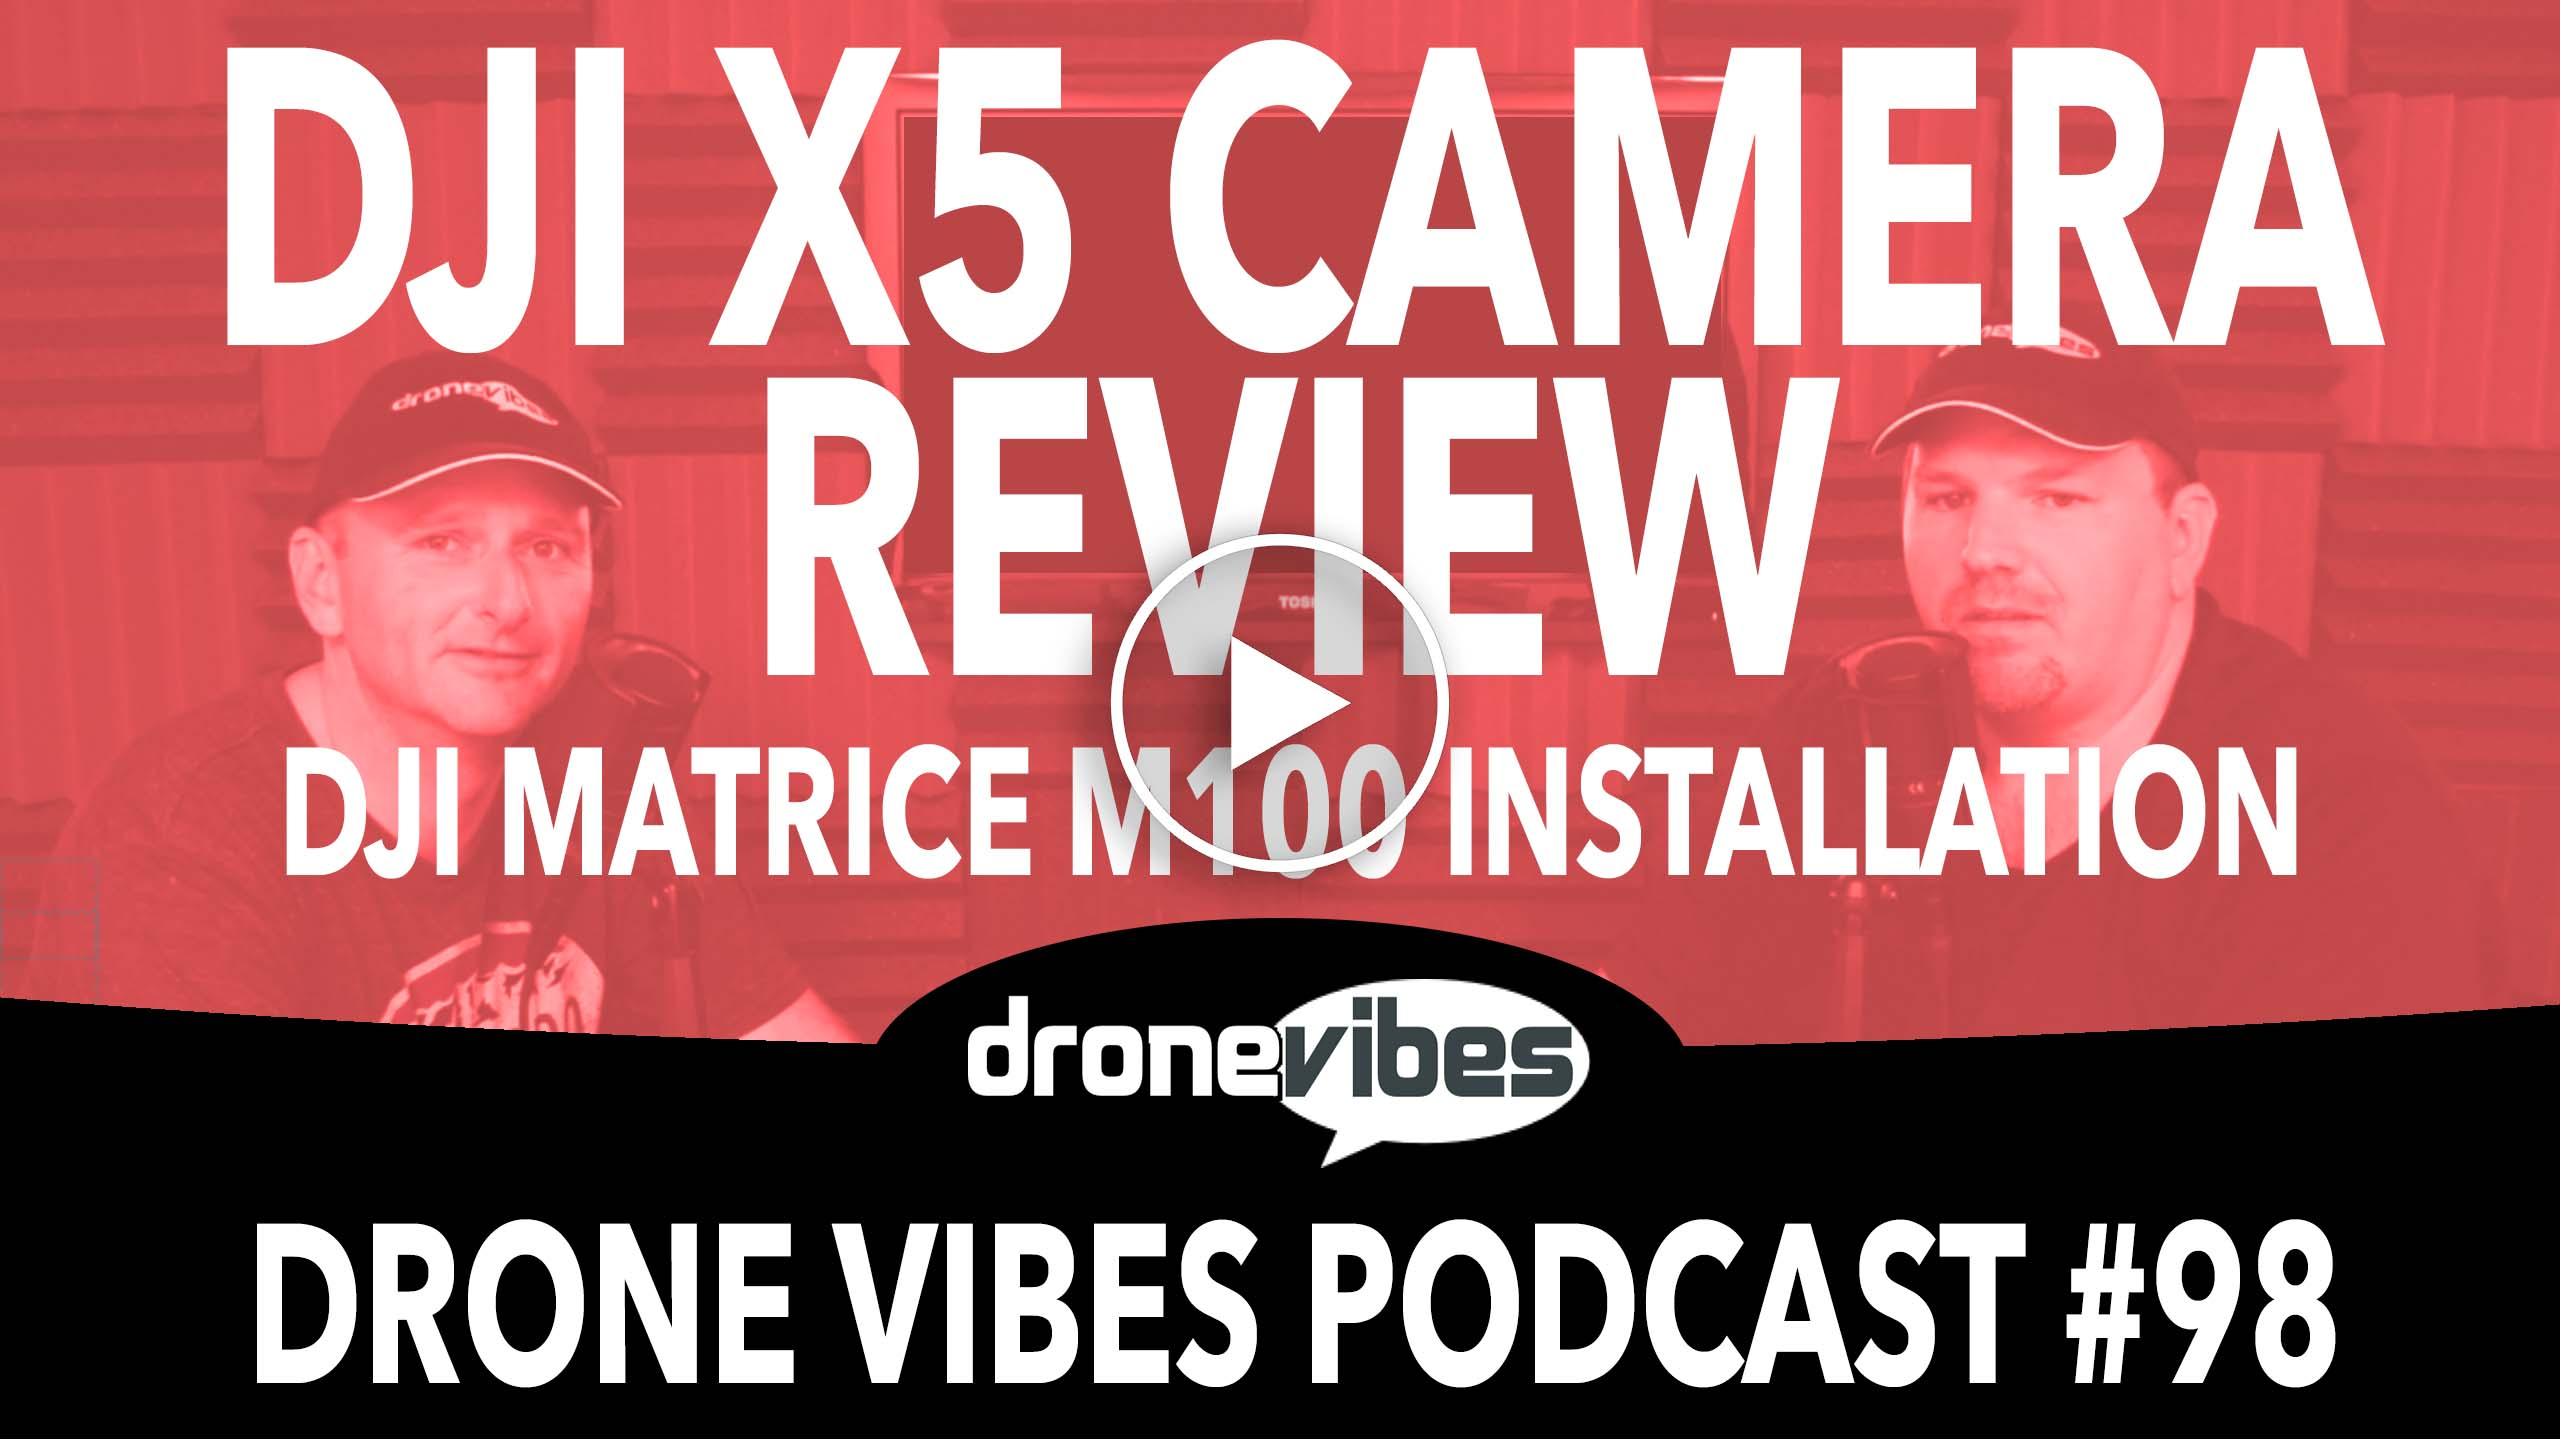 DJI X5 Camera Review – DJI Matrice M100 – Drone Vibes Podcast Video